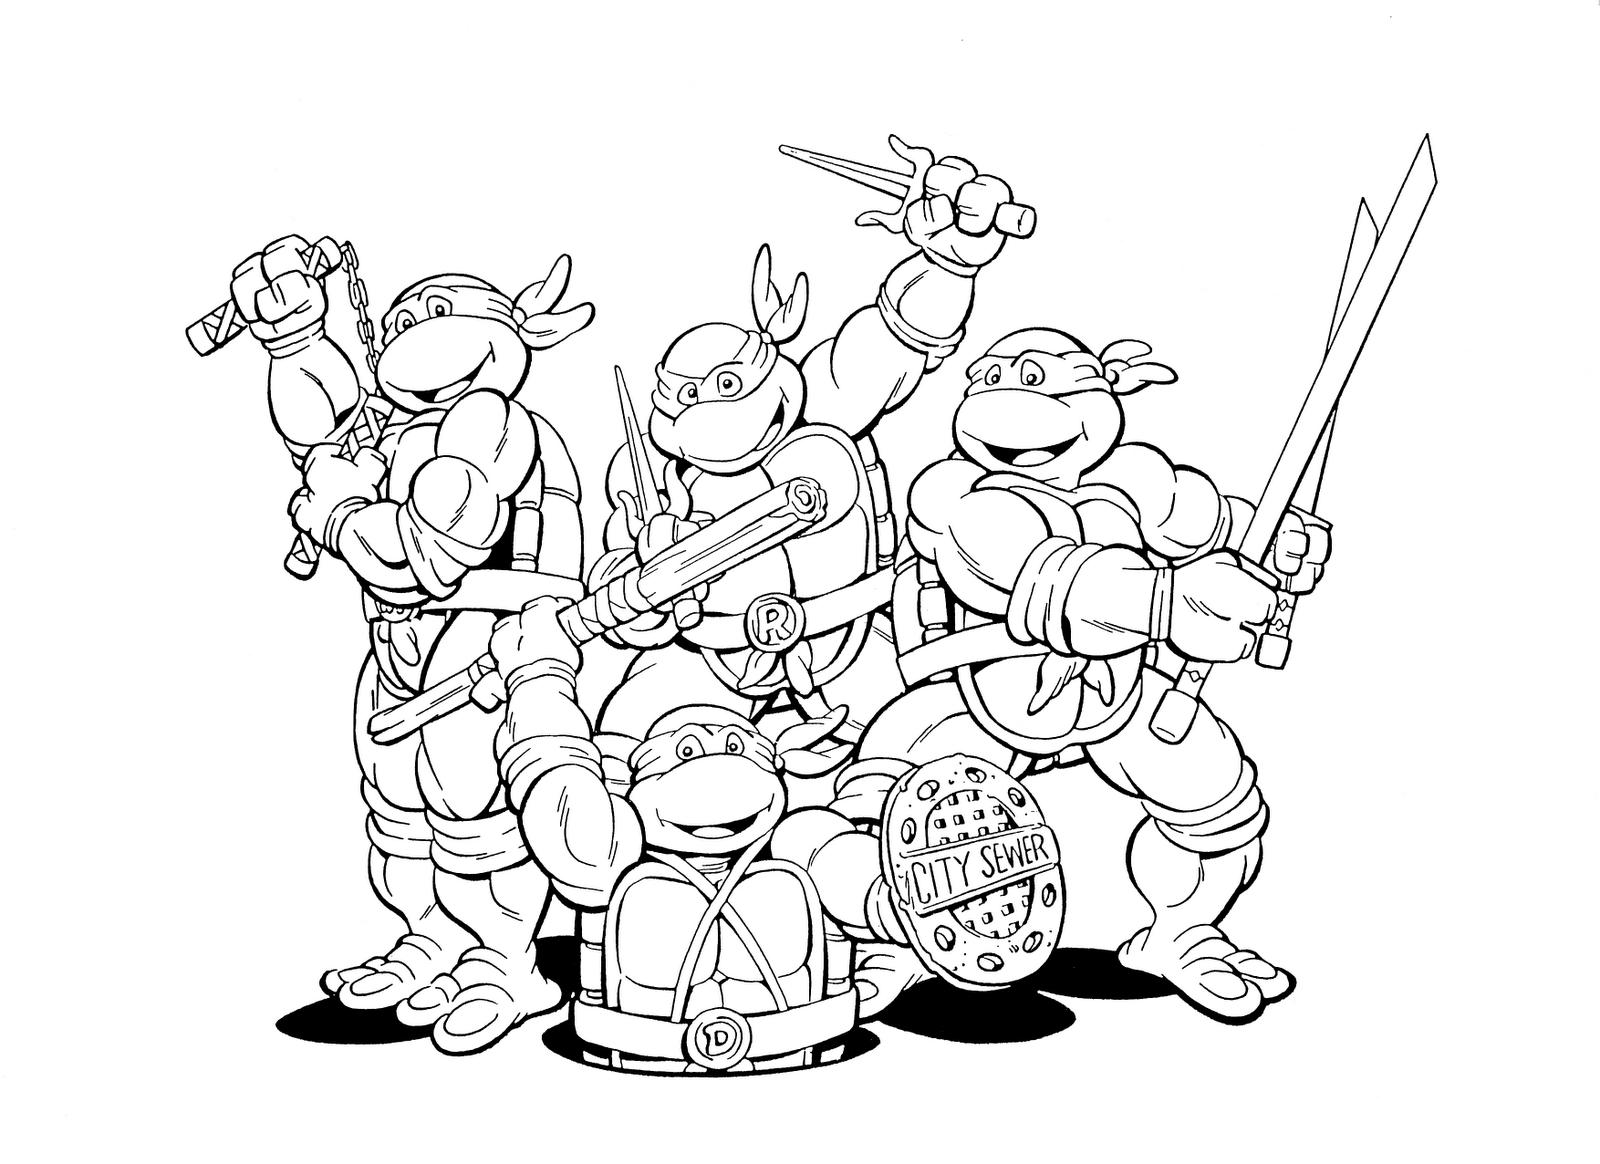 ninja turtles free coloring pages teenage mutant ninja turtles coloring pages best turtles coloring free ninja pages